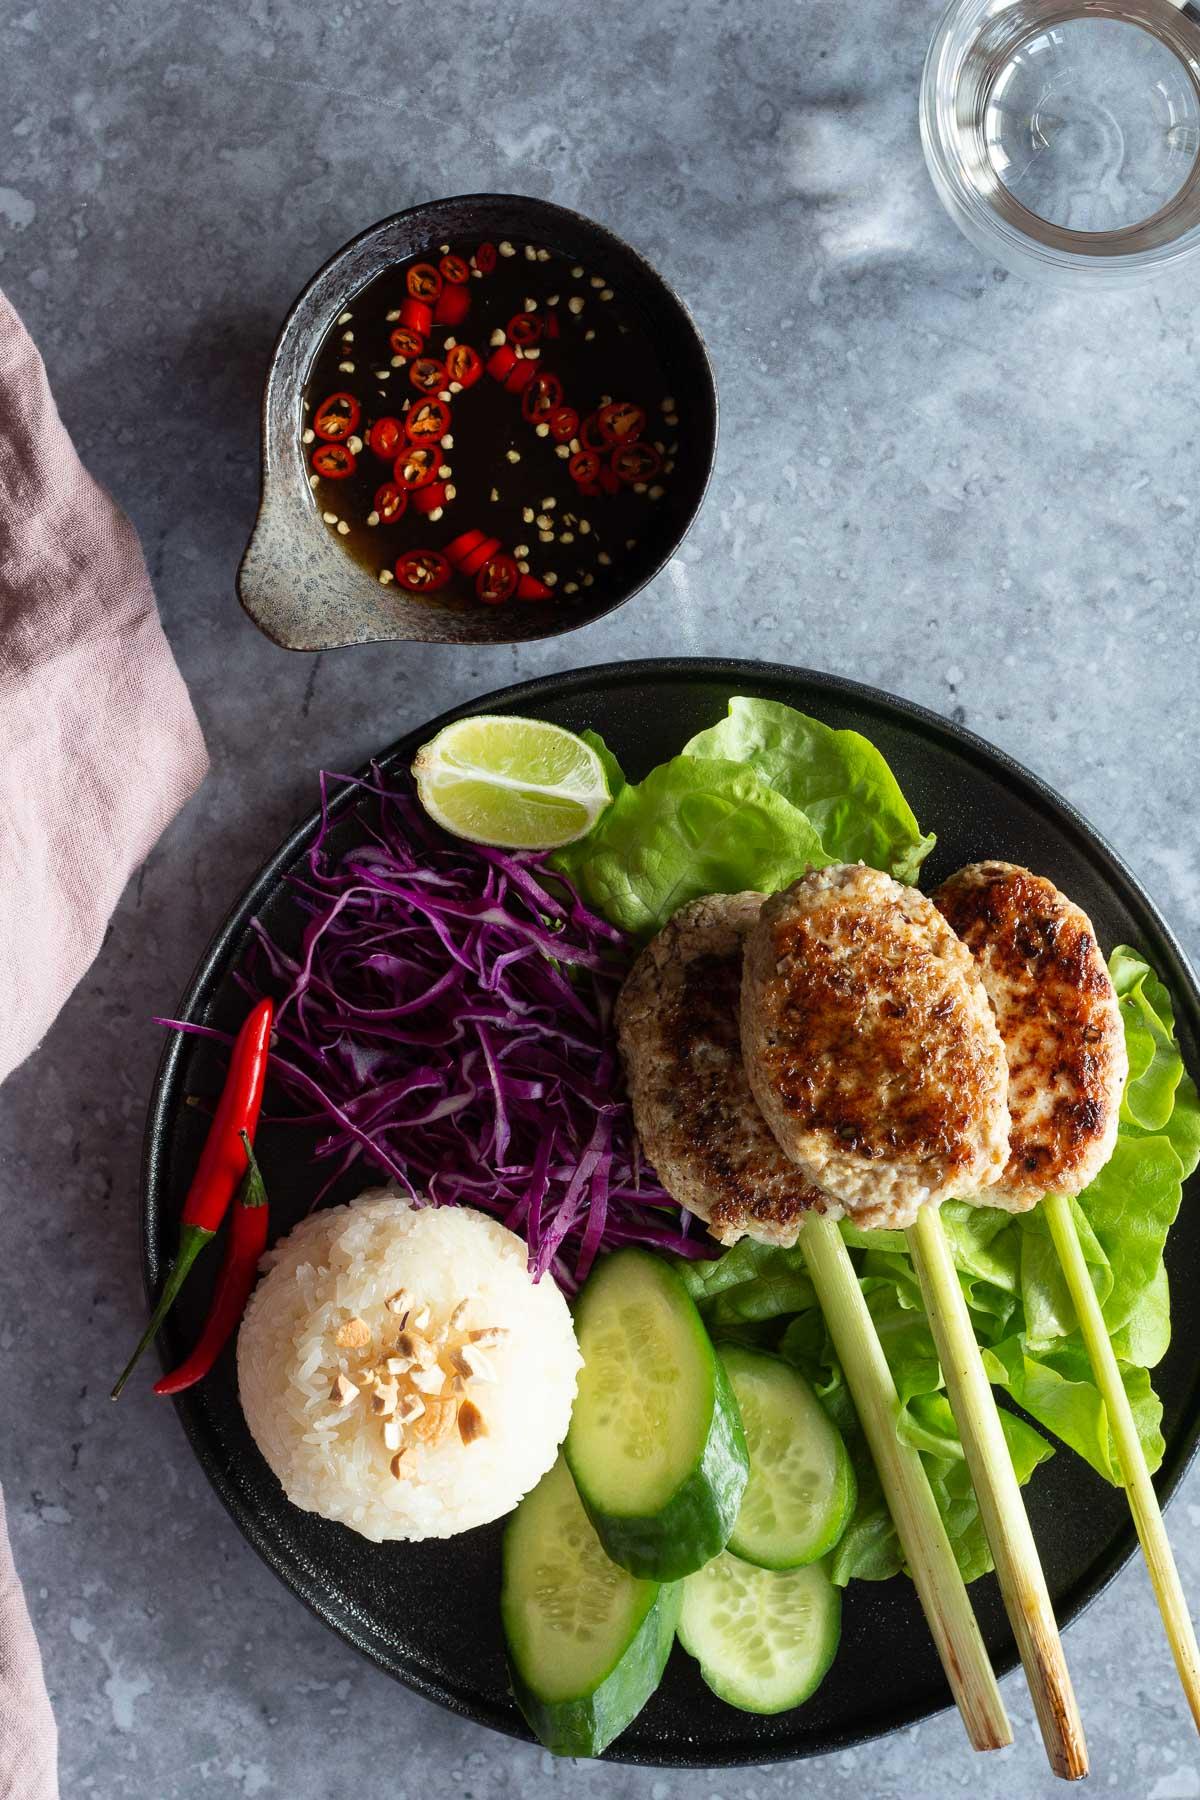 Lemongrass Pork Skewer with dipping sauce and fresh veggies